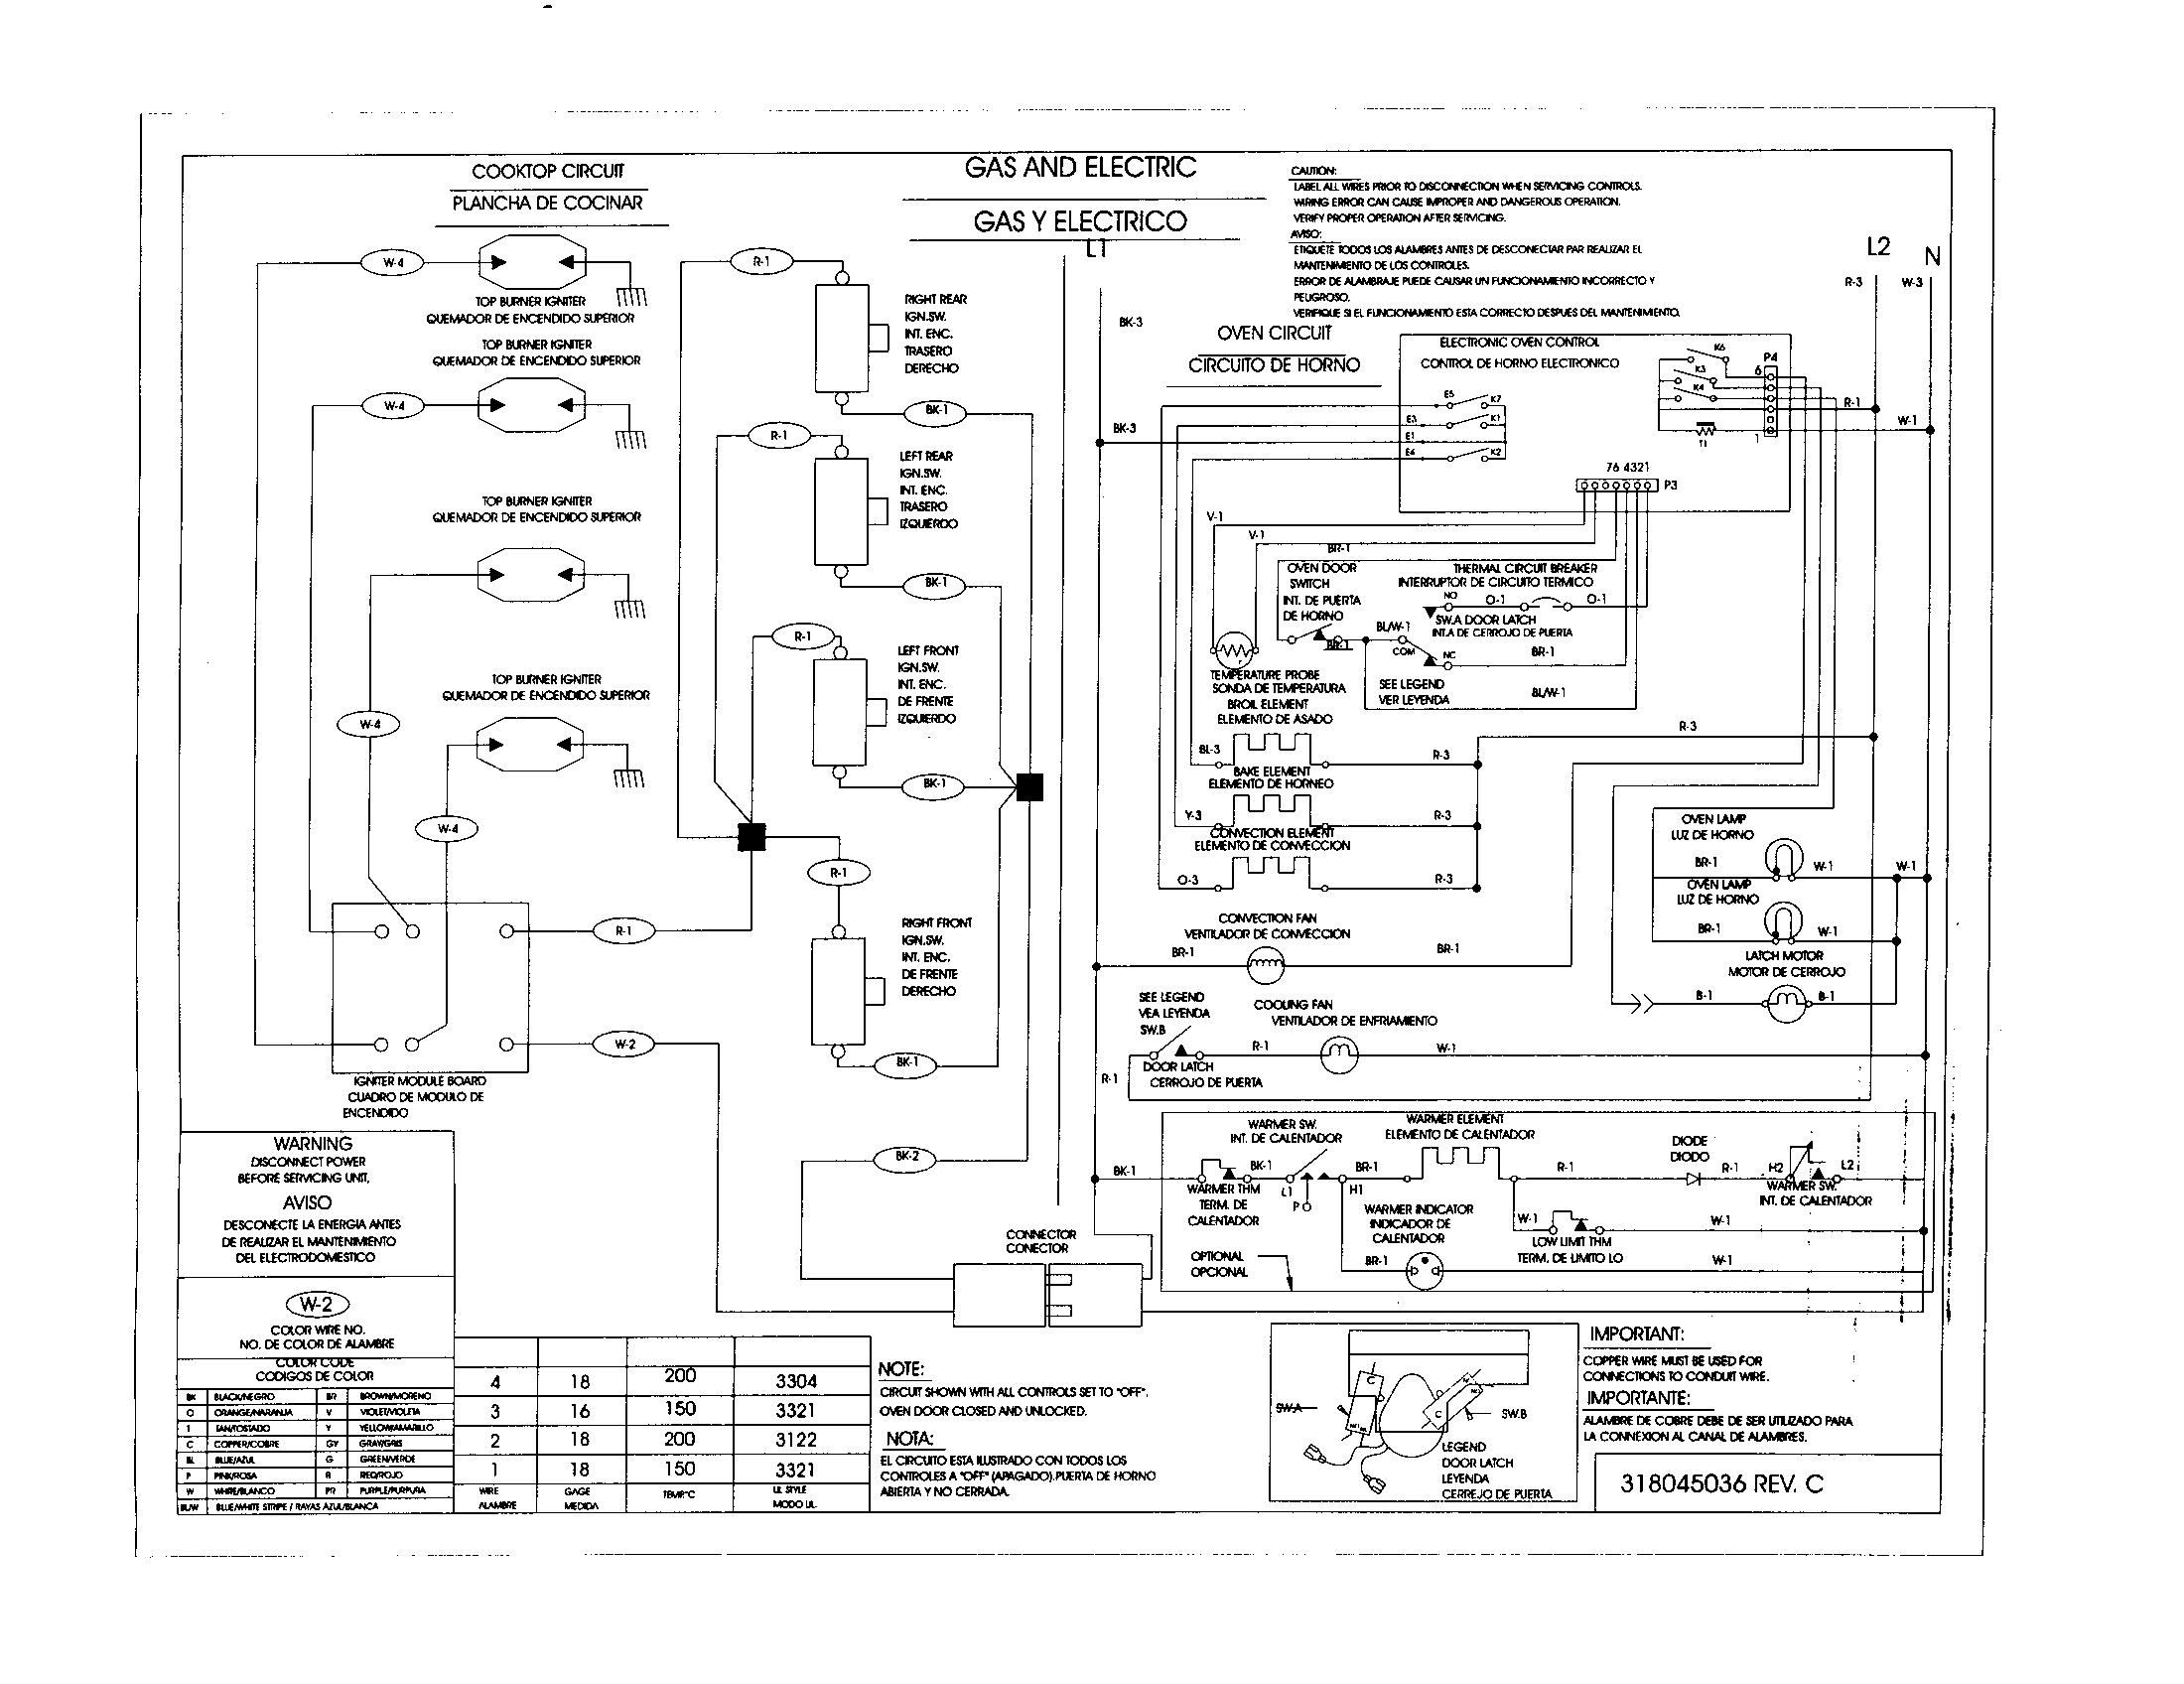 Ge Stove Wiring Schematic - Usb Sata Data Cable Wiring Diagram -  clubcar.ati-loro.jeanjaures37.frWiring Diagram Resource